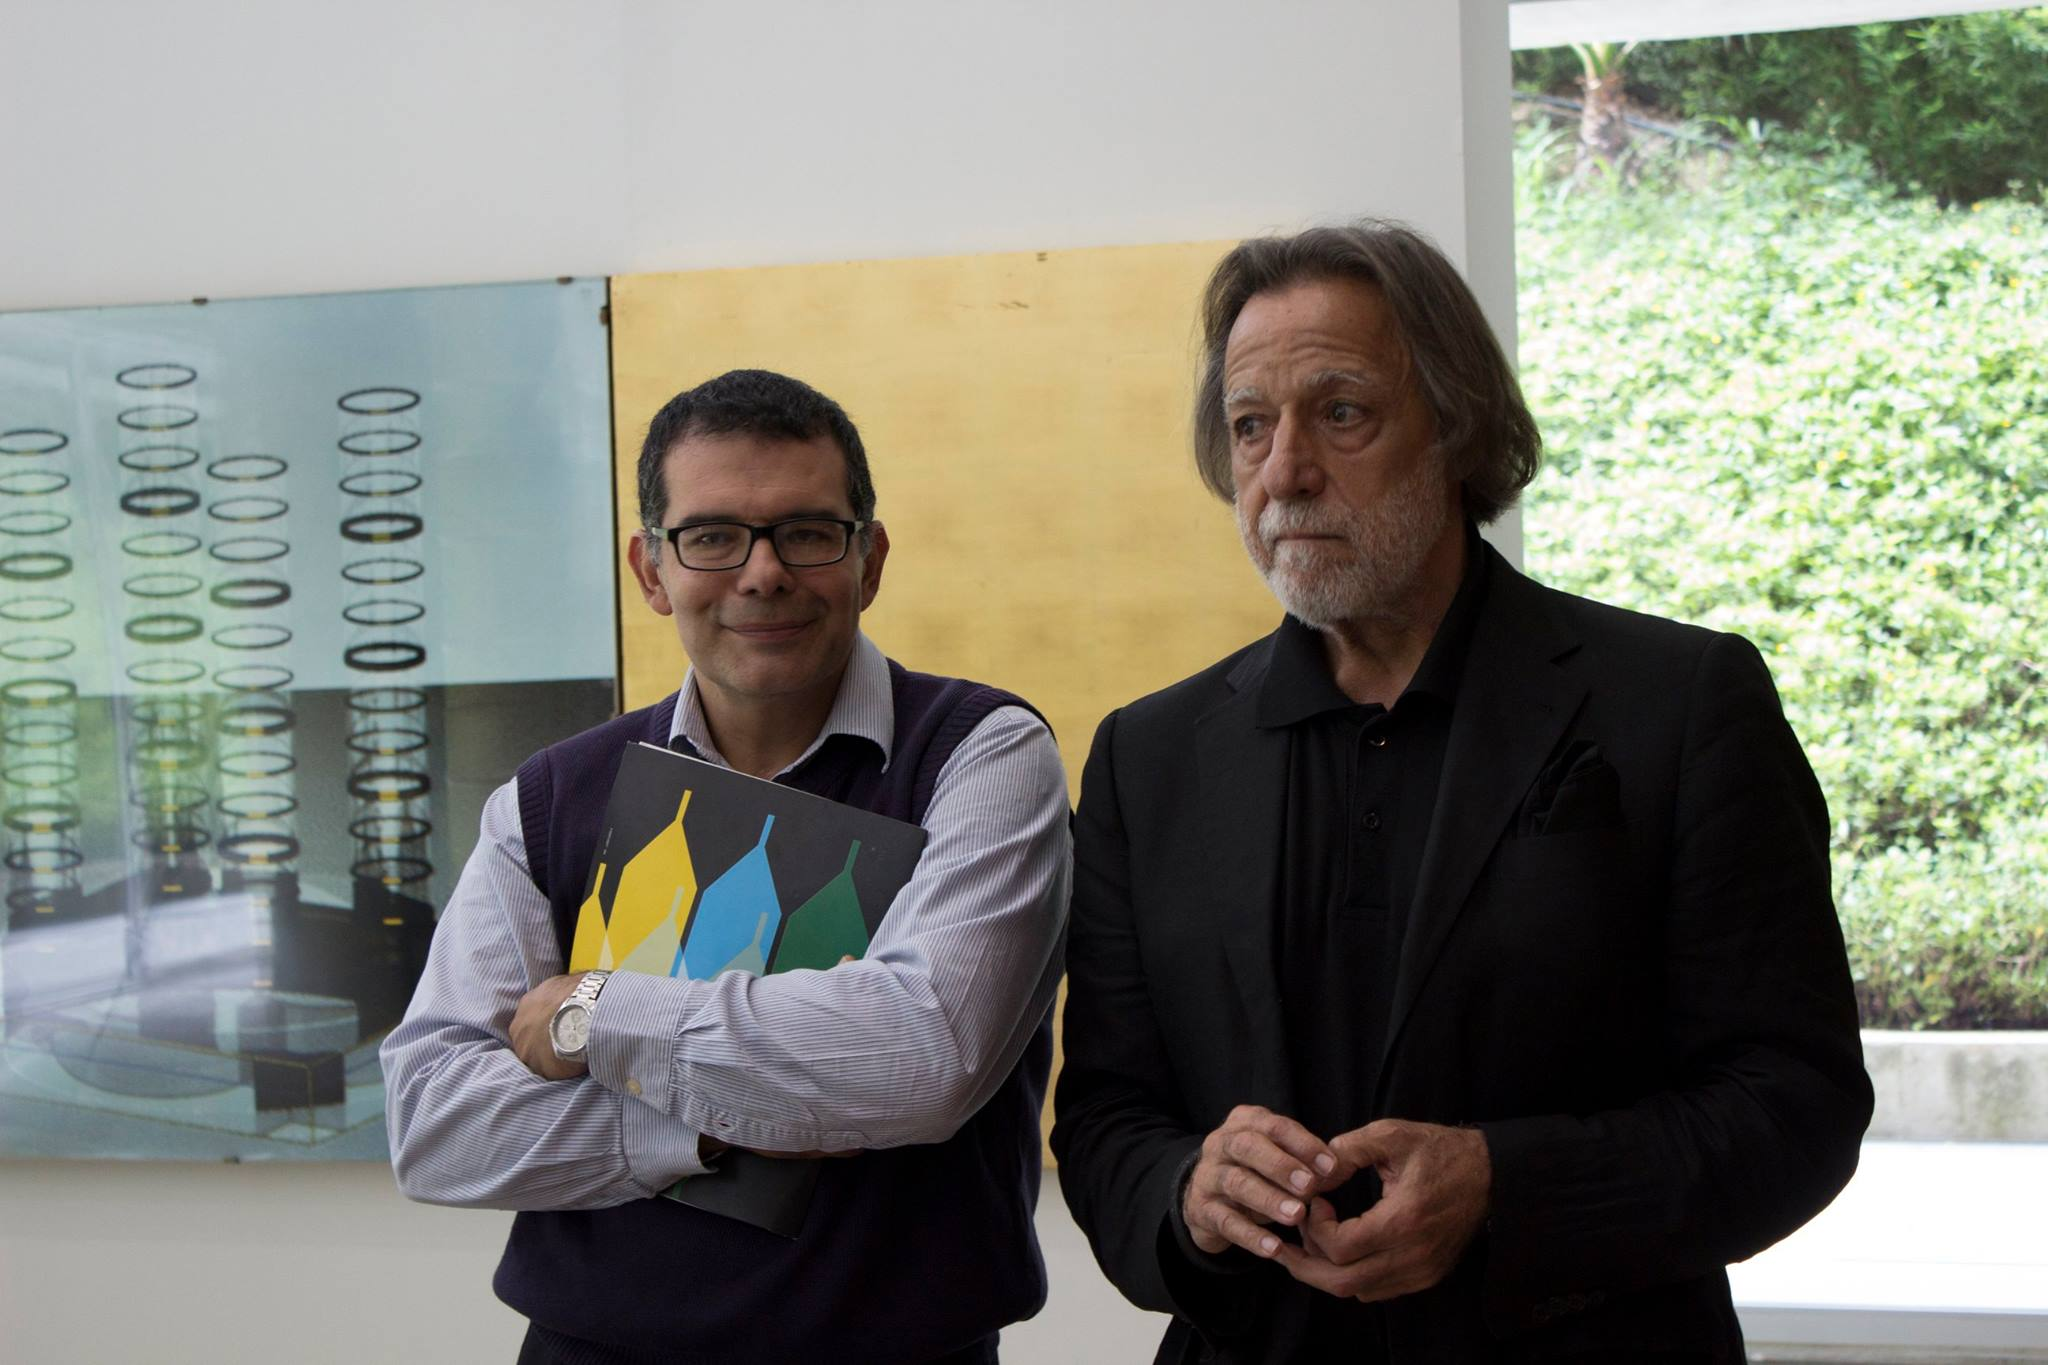 Sofía Imber, Rolando Peña,Jorge Gutierrez and Natasha Colebrook-Williams